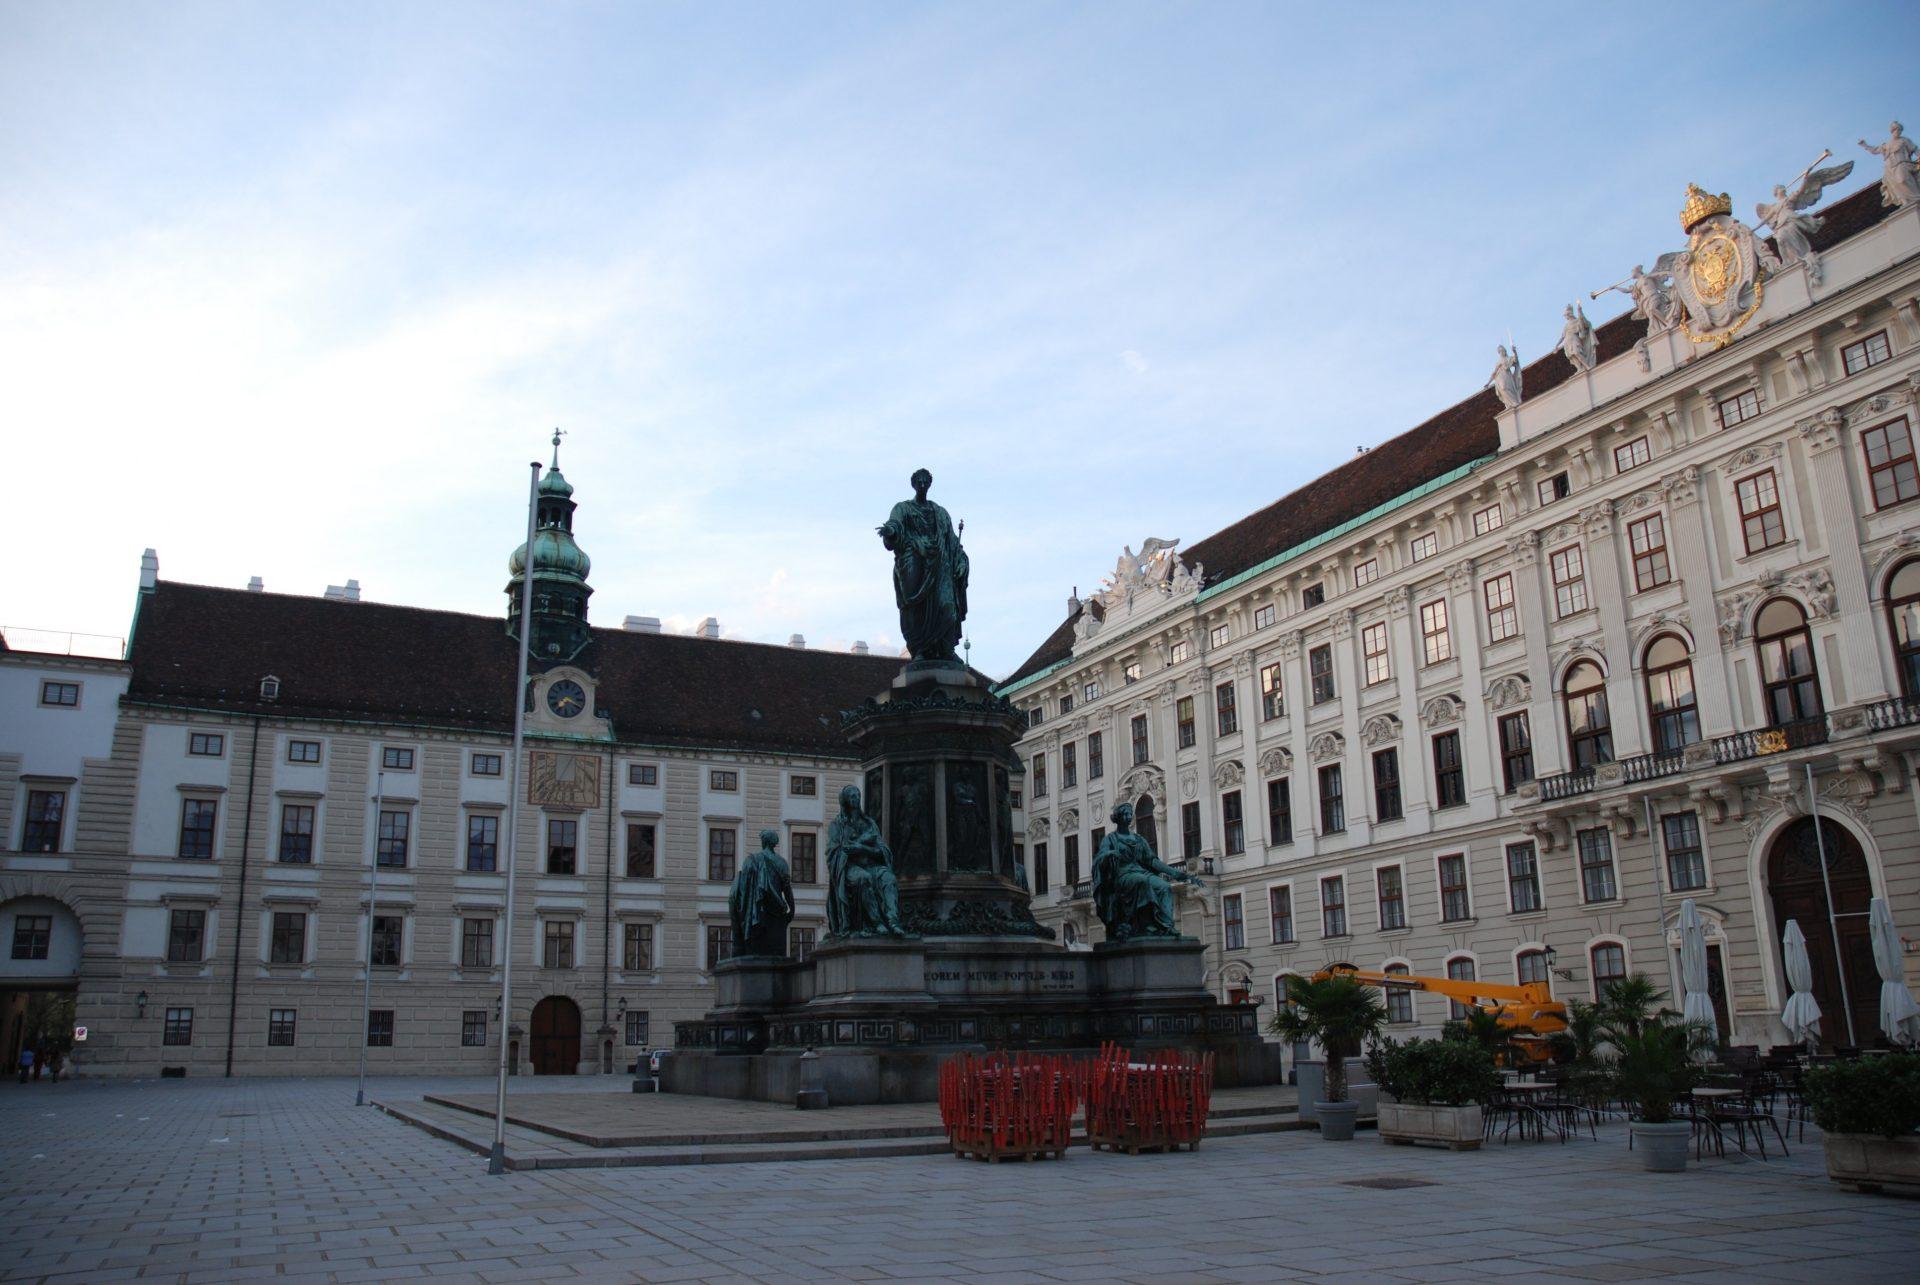 Памятник Кайзеру Францу I, Вена, Австрия. Июнь, 2012